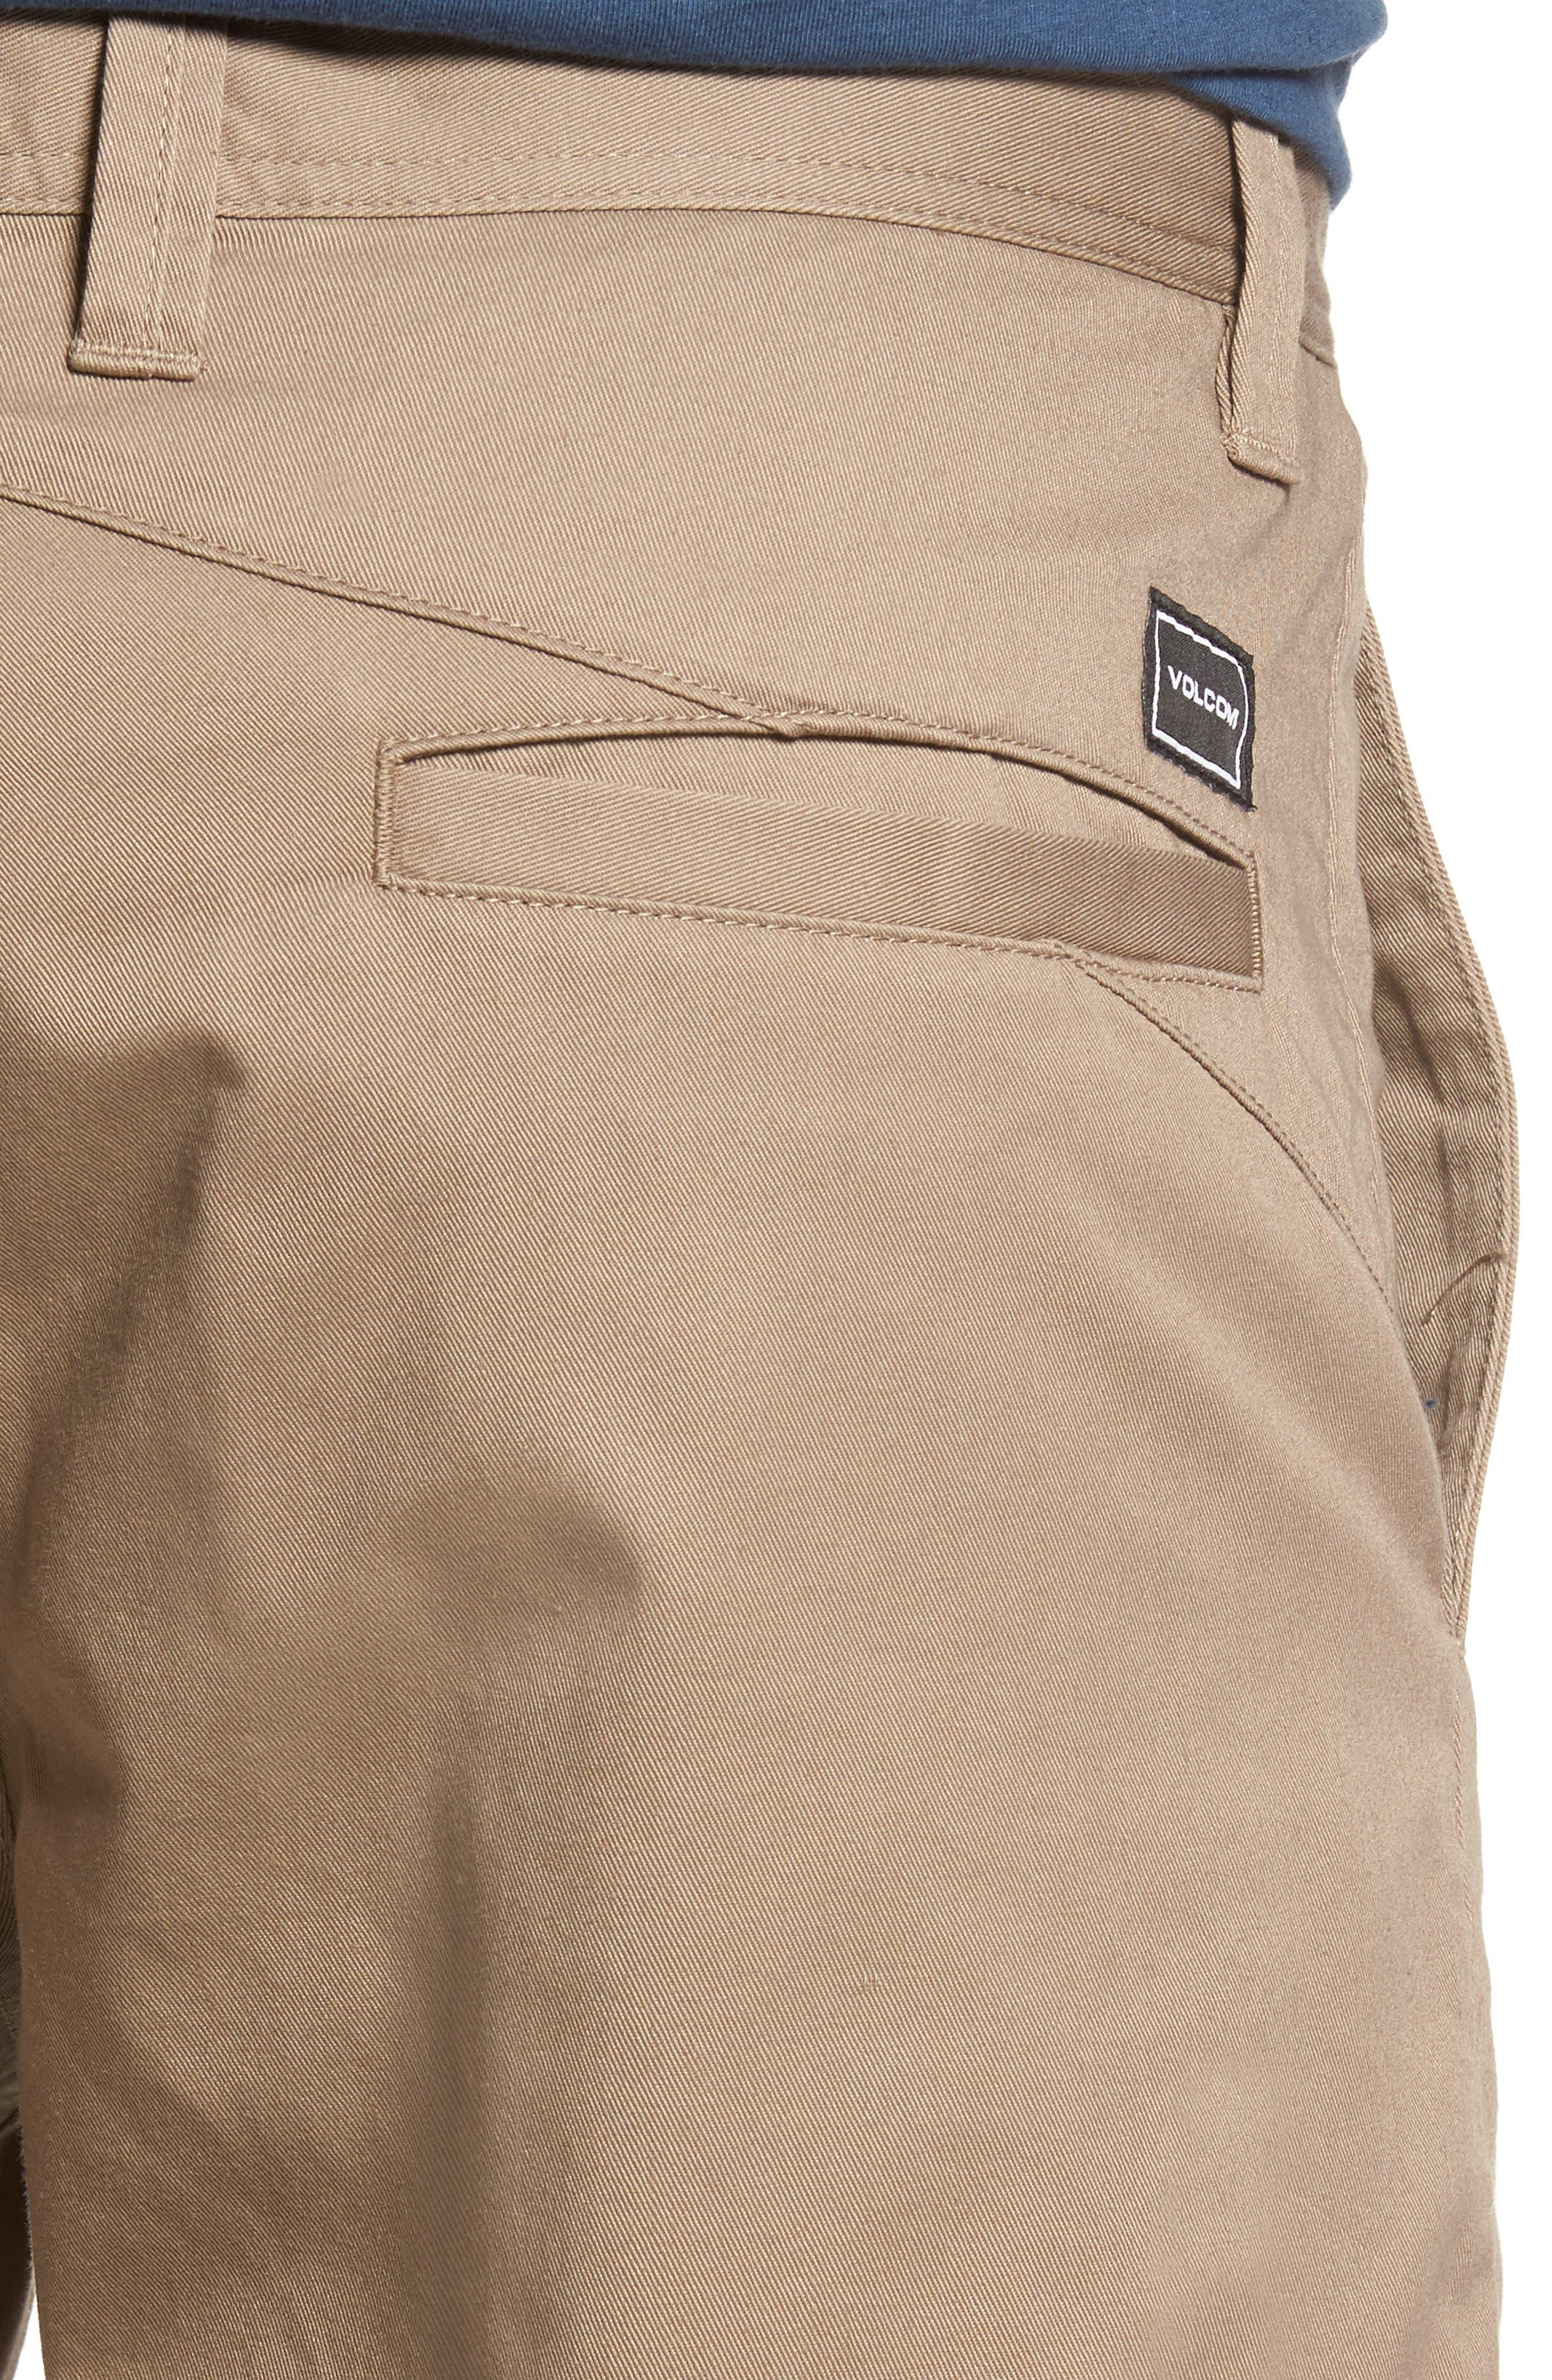 Modern Chino Shorts,                             Alternate thumbnail 4, color,                             KHAKI